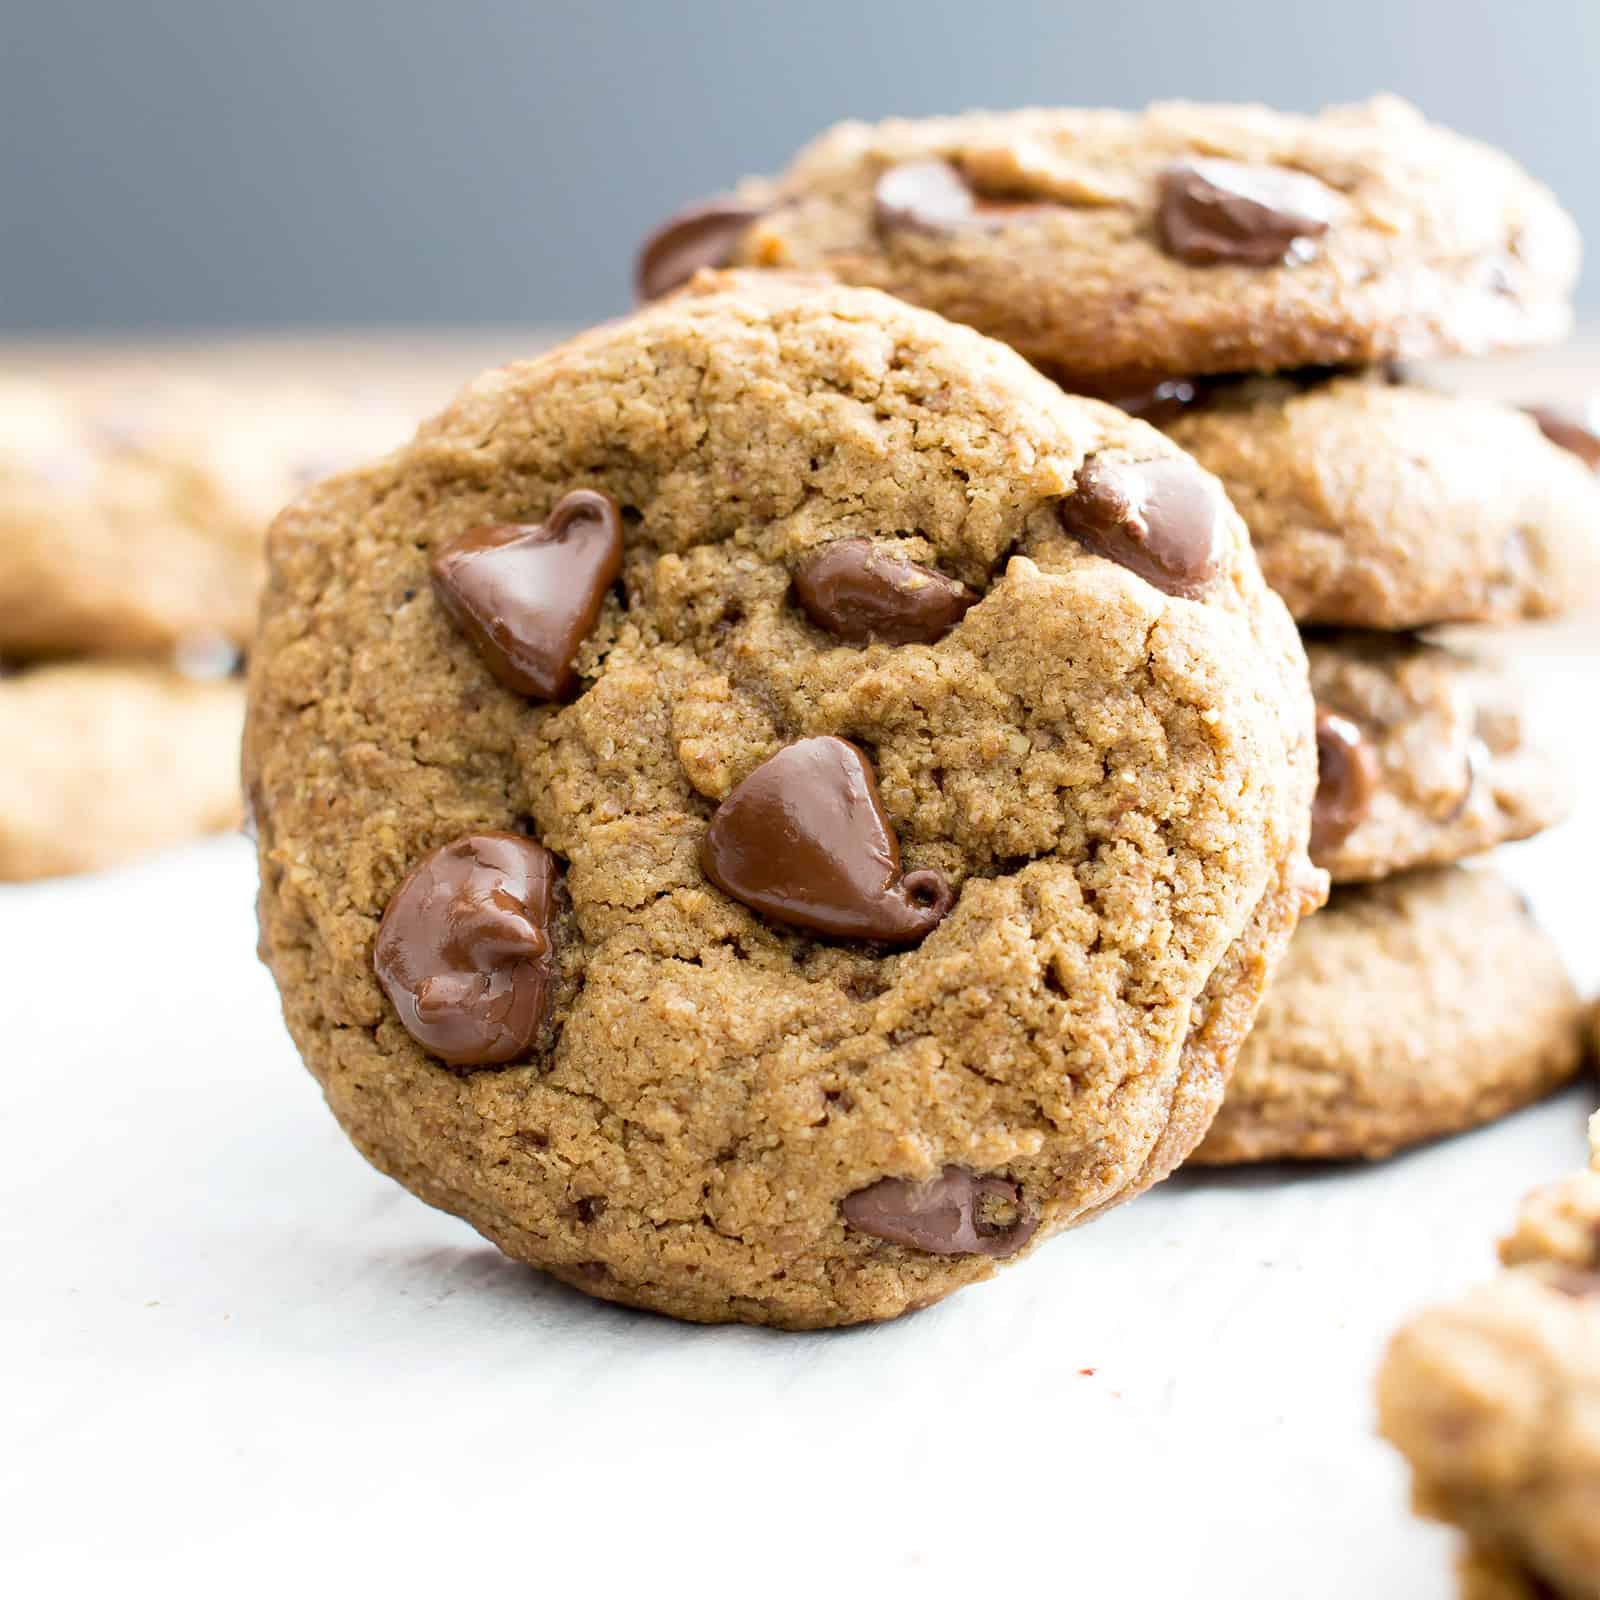 Sugar Free Chocolate Chip Cookies  Vegan Chocolate Chip Cookies Recipe Gluten Free Dairy